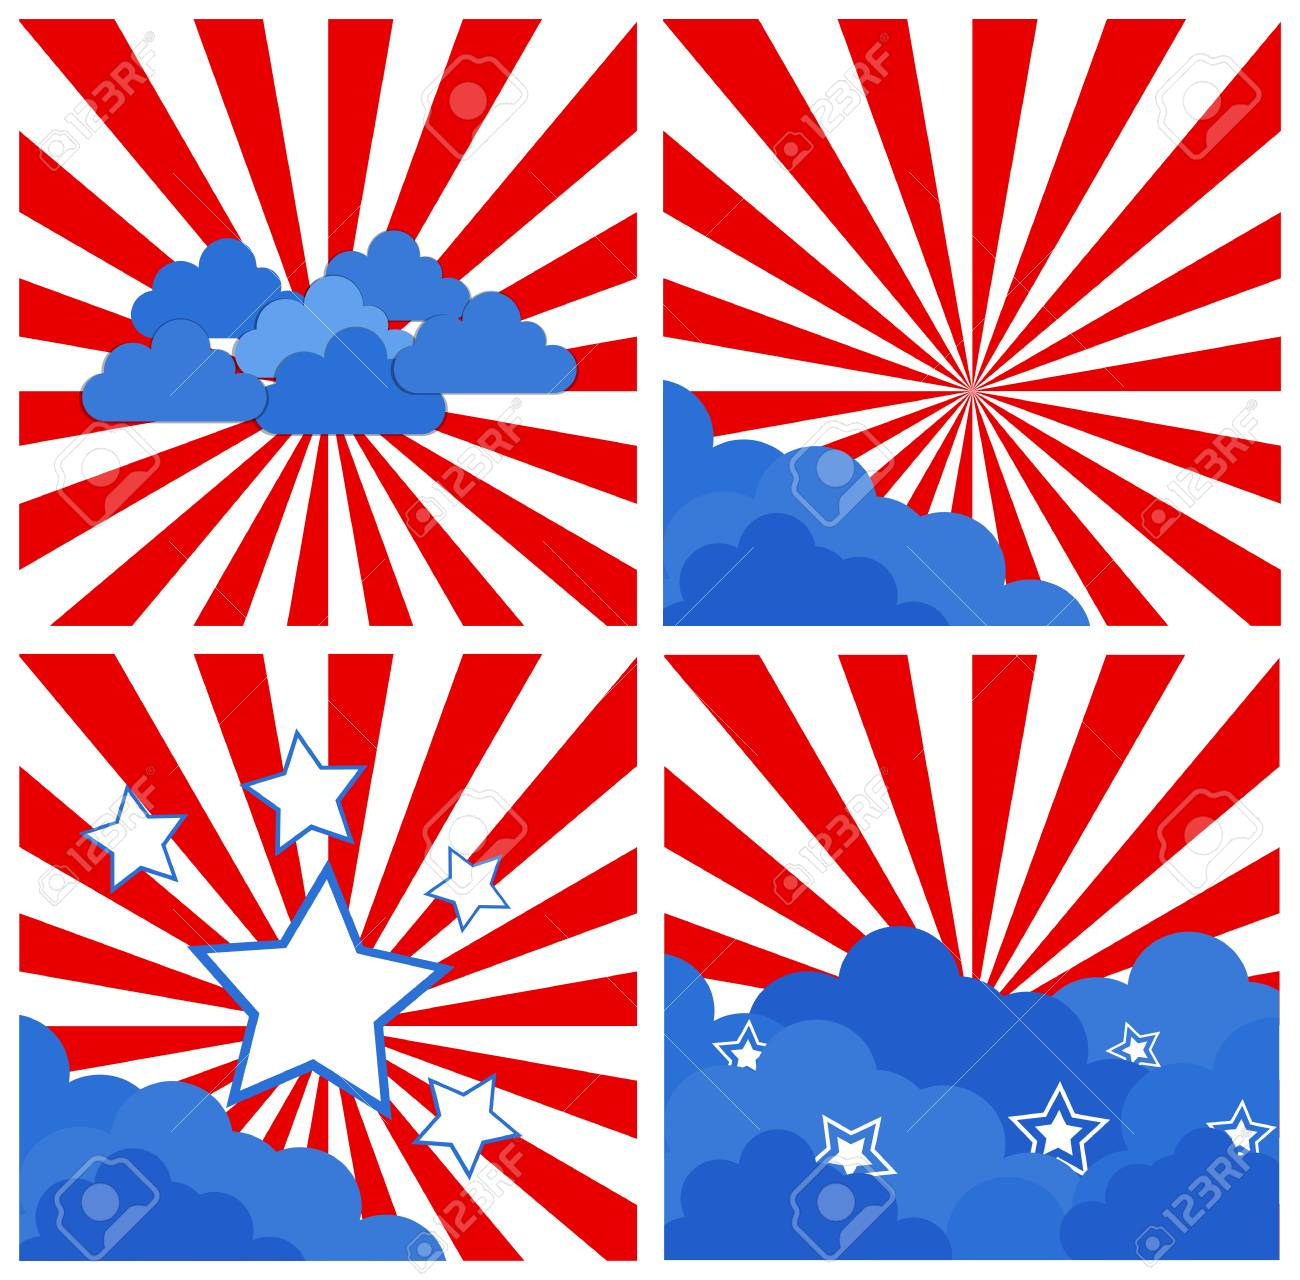 sunburst set - Patriotic USA theme Vector Stock Vector - 22318356